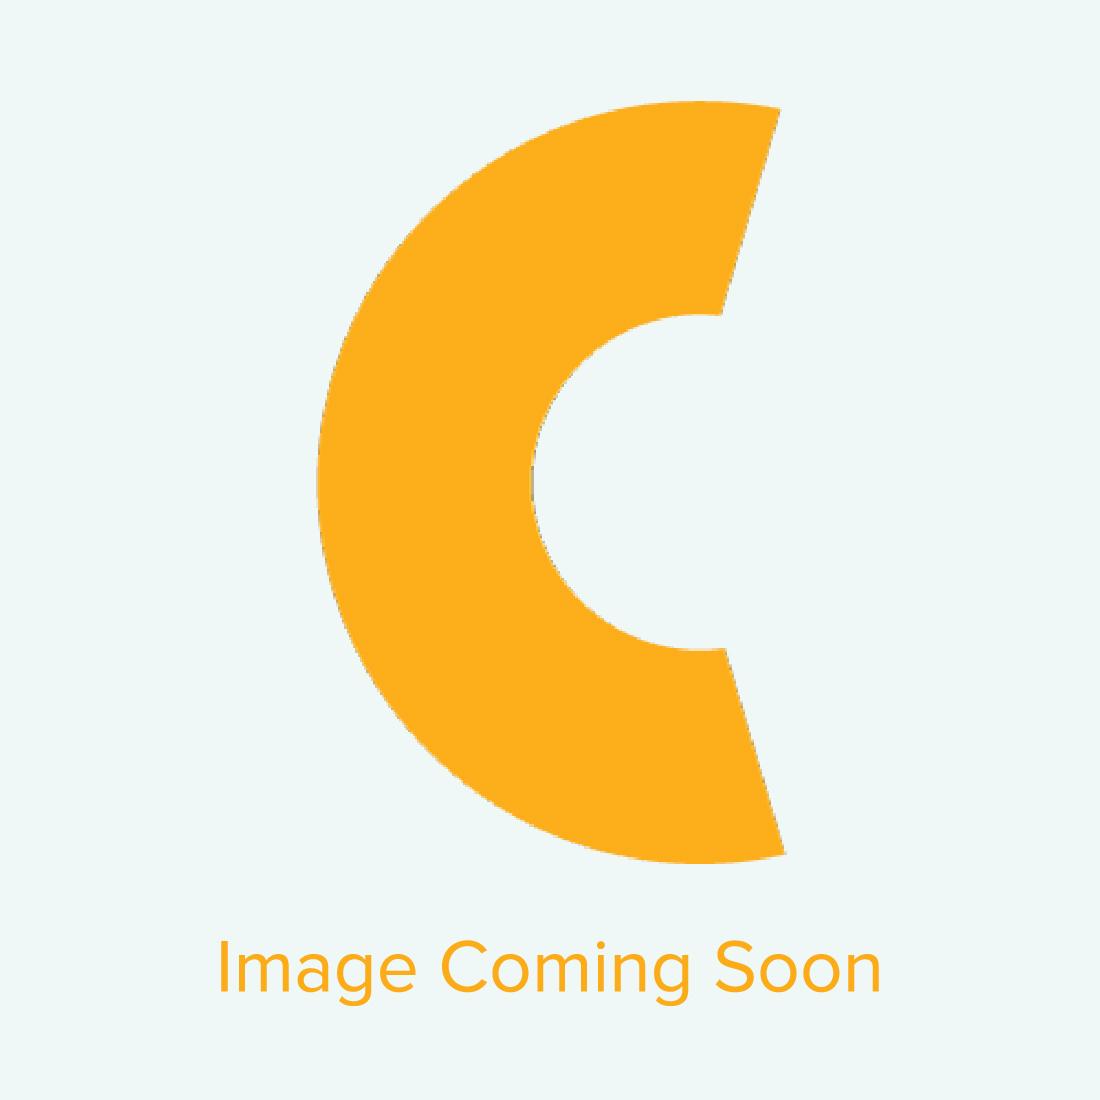 "Chemica Hotmark Chevron Heat Transfer Vinyl - 15"" wide"